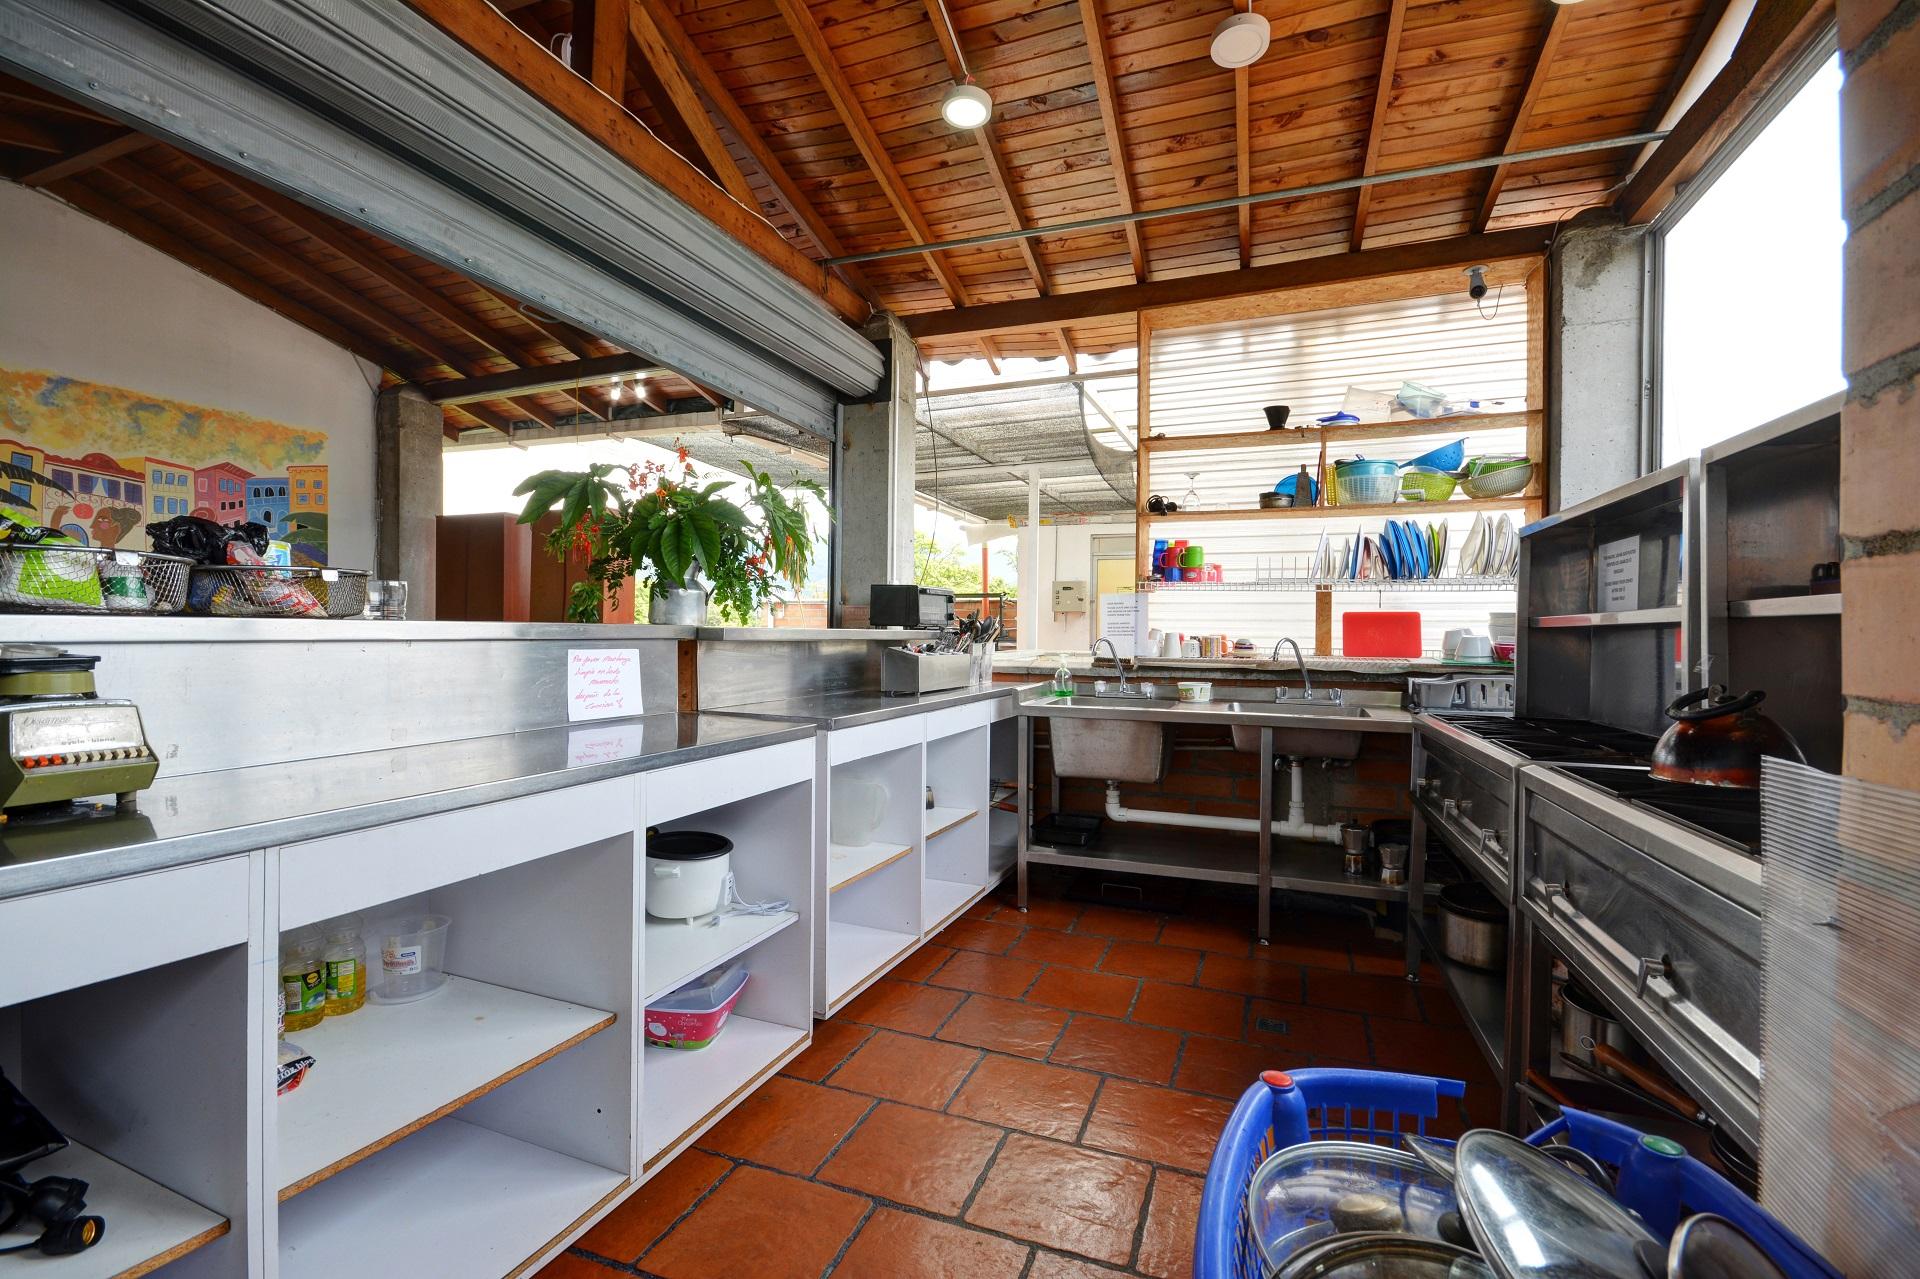 International House and Hostel Medellin